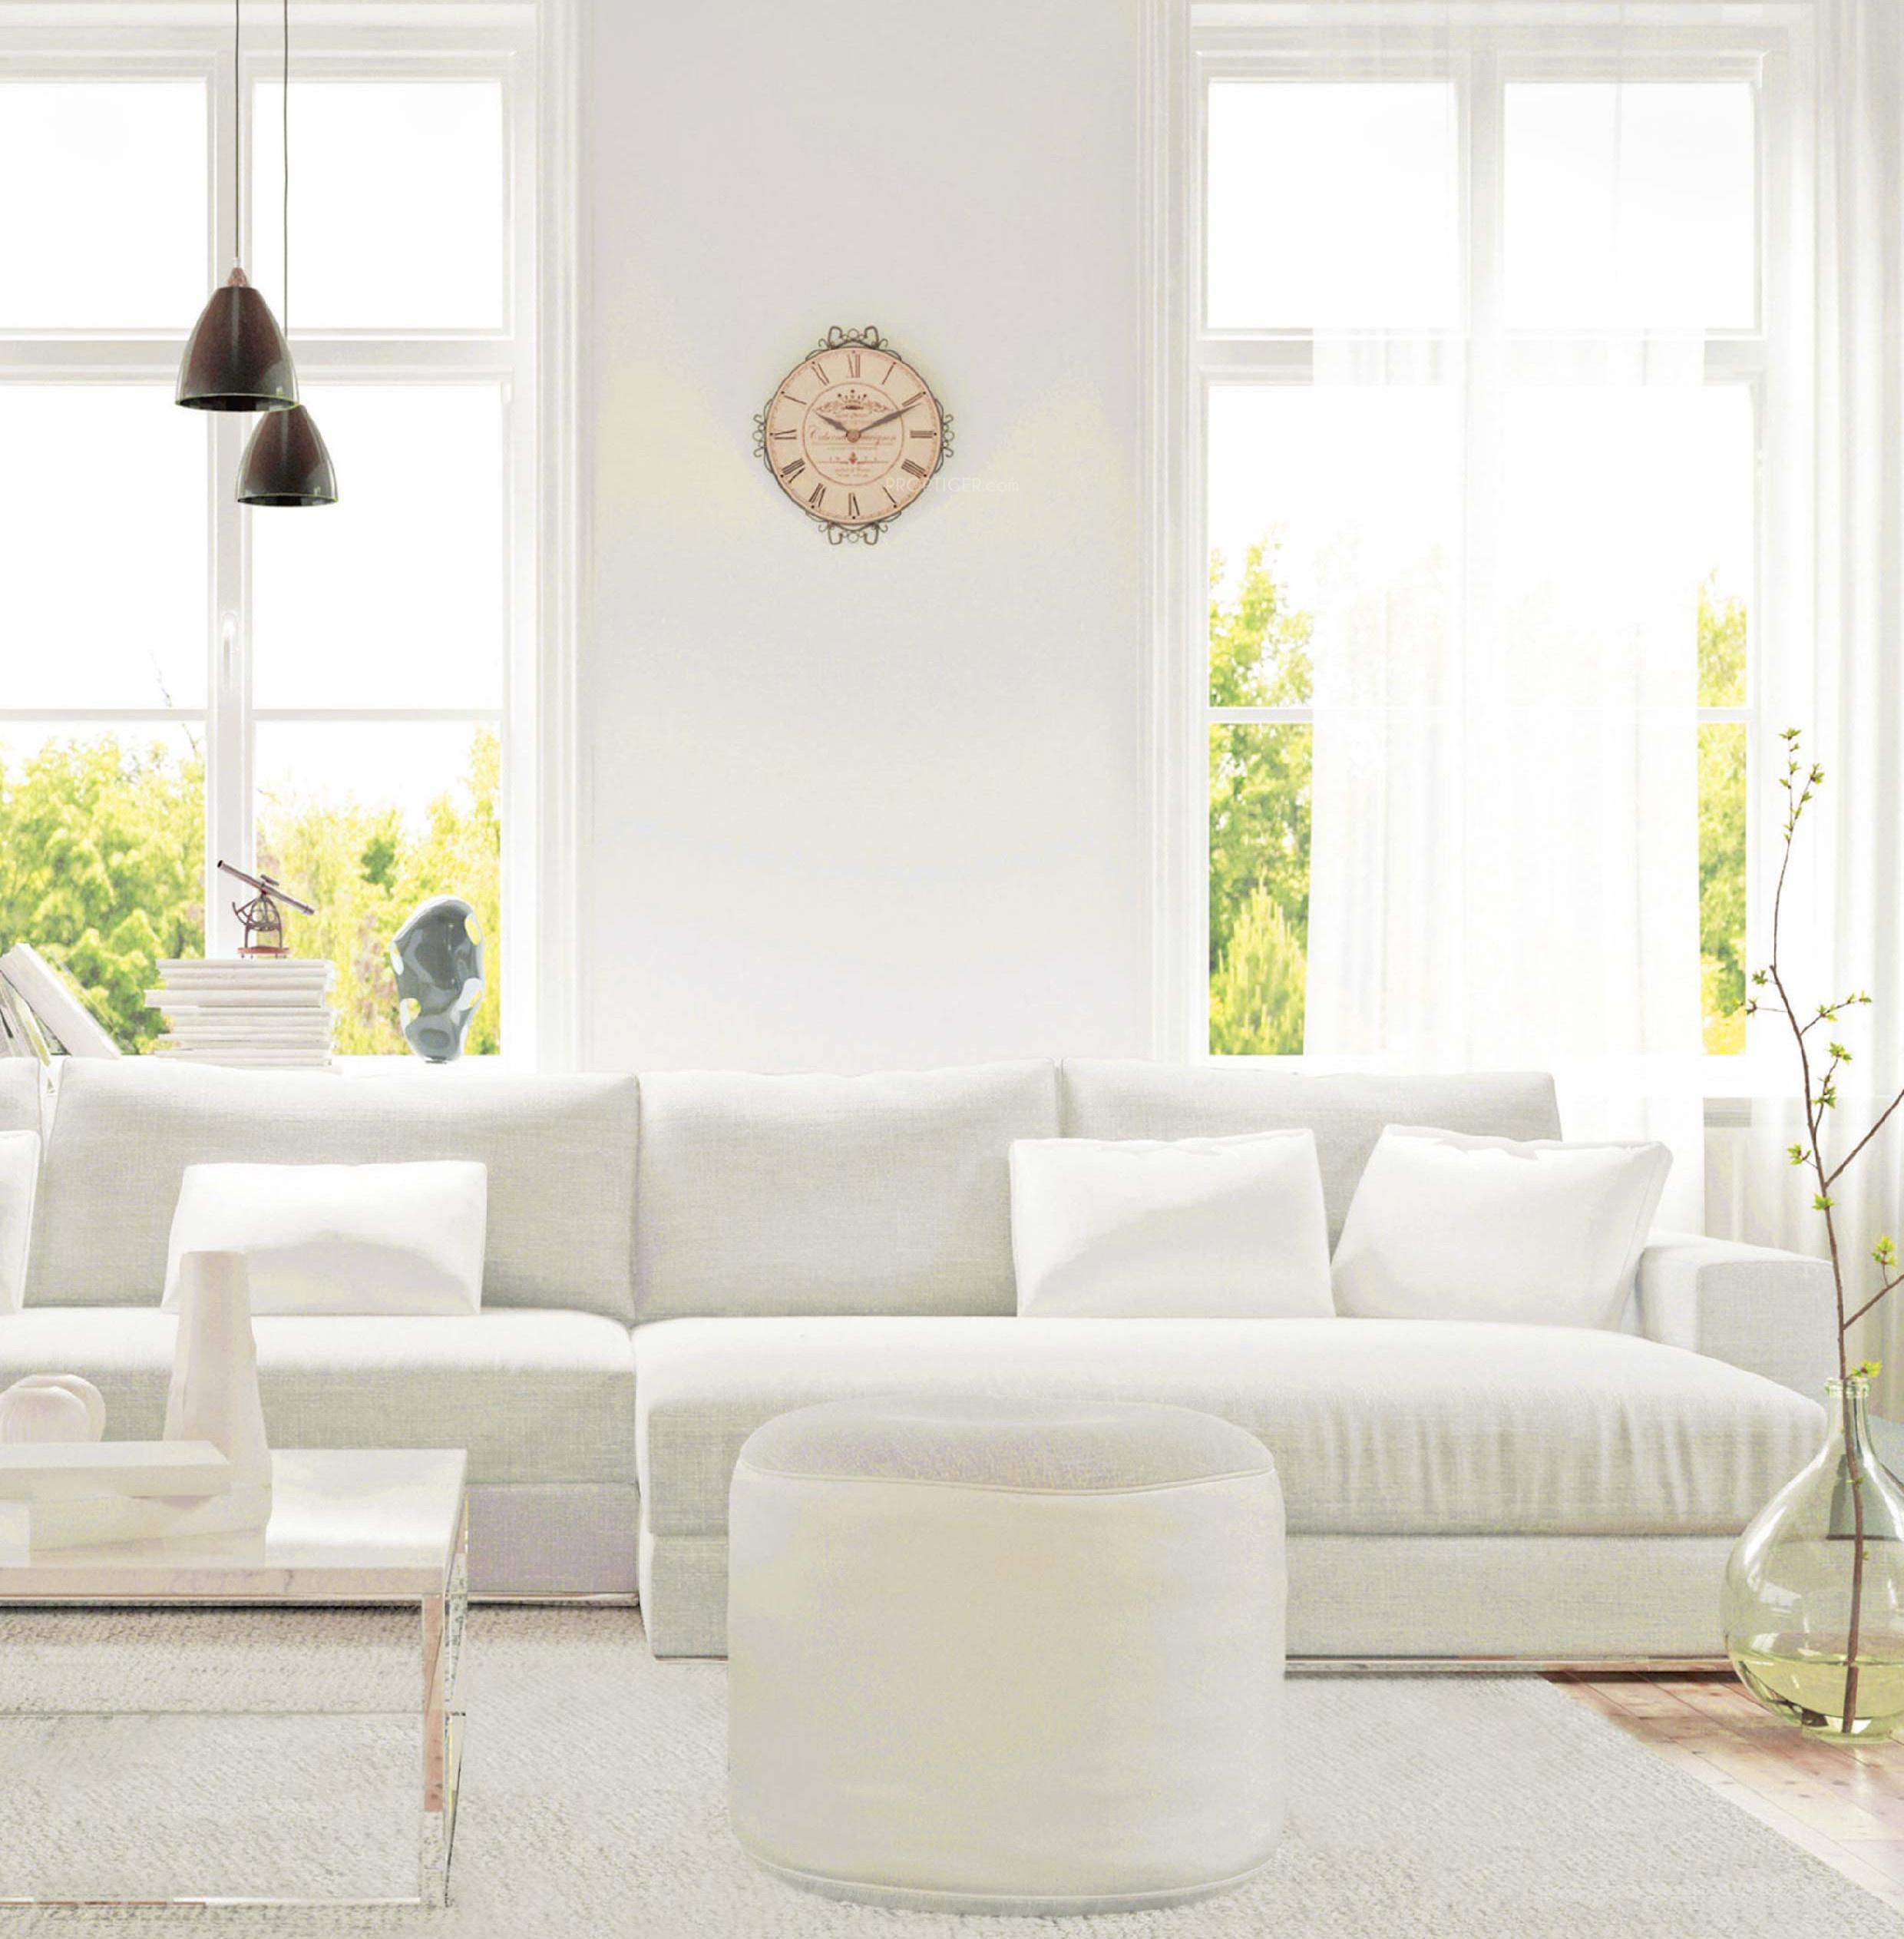 Copper Terrace Apartments: 600 Sq Ft 1 BHK 2T Apartment For Sale In Supertech Azalia